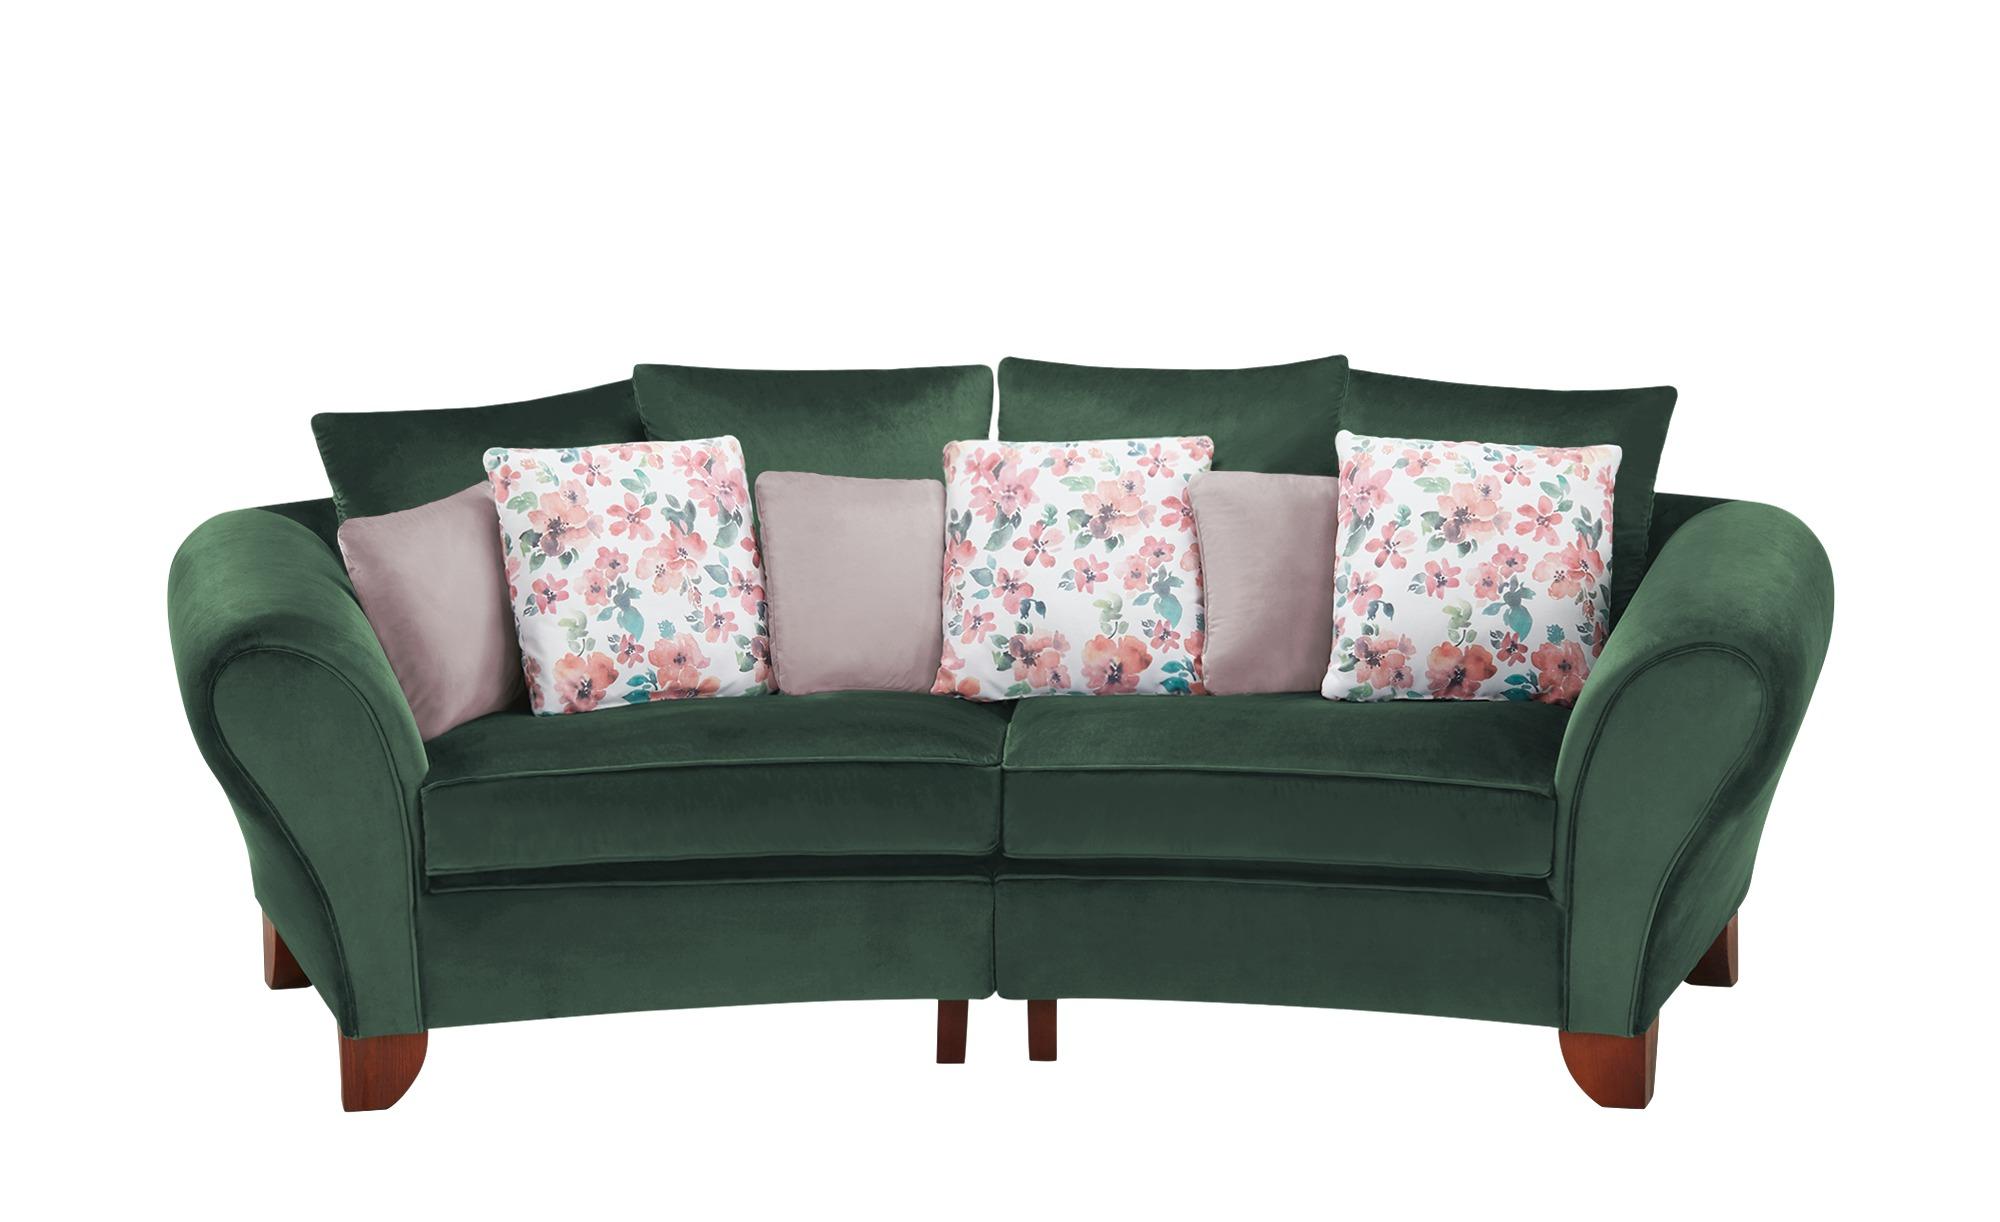 smart Big Sofa  Nadja ¦ grün ¦ Maße (cm): B: 277 H: 95 T: 108 Polstermöbel > Sofas > 3-Sitzer - Höffner